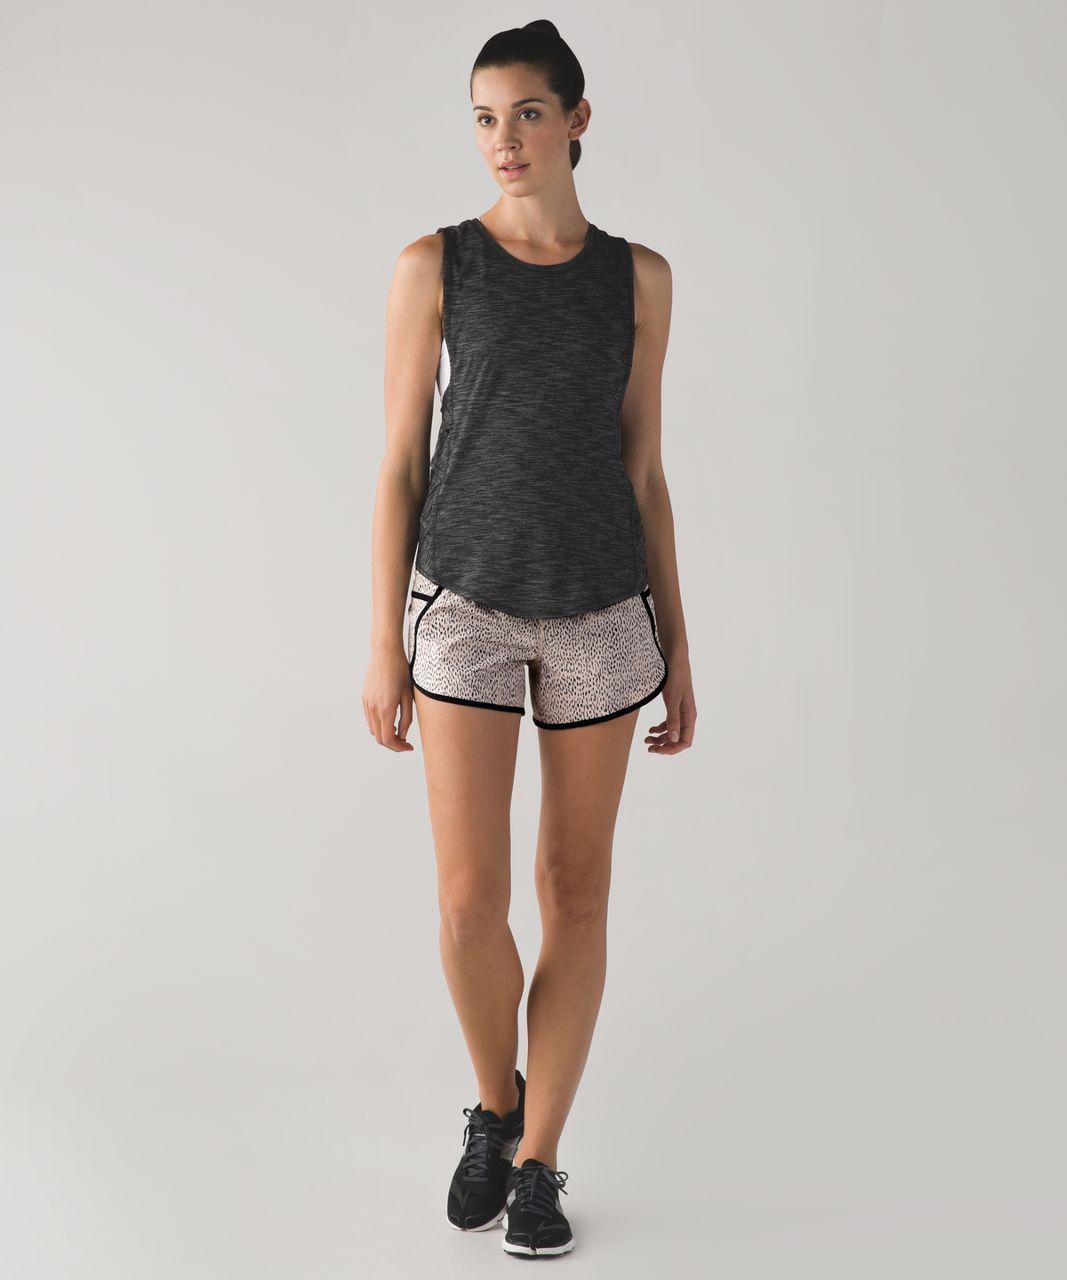 Lululemon Tracker Short III *4-way Stretch - Dottie Dash Grain Black / Black